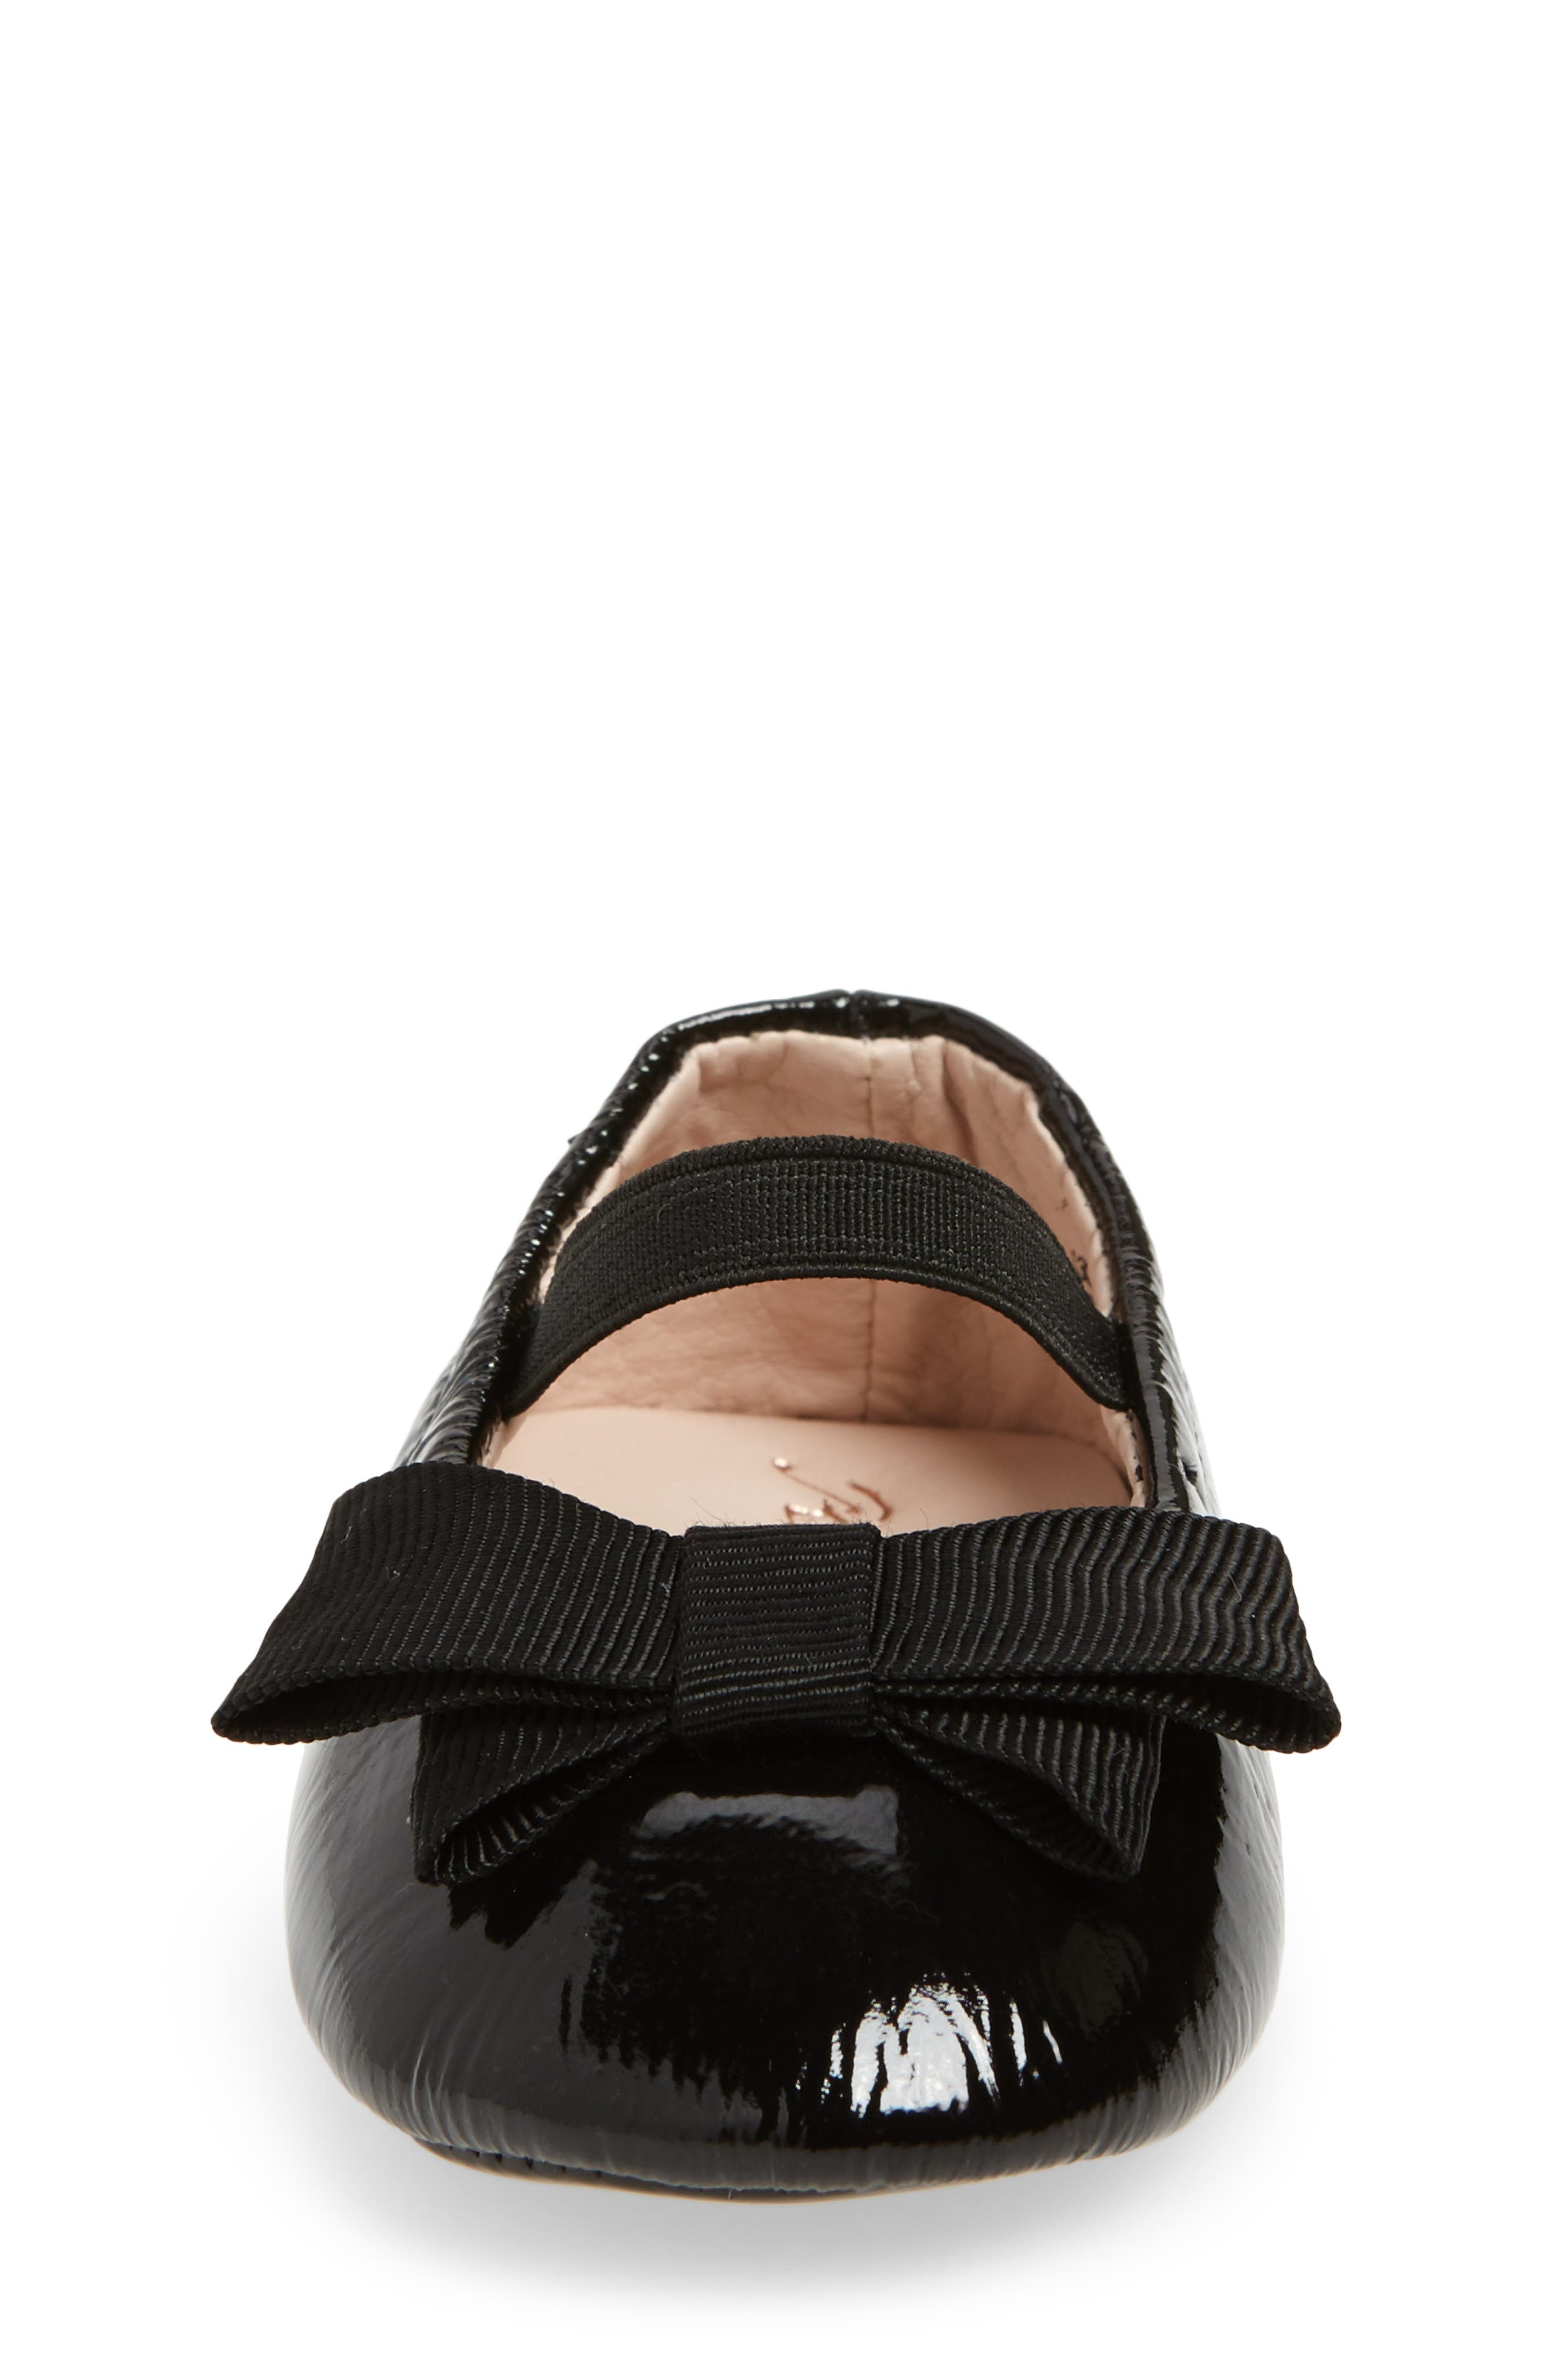 Lilia Mary Jane Flat,                             Alternate thumbnail 4, color,                             Black Patent Leather